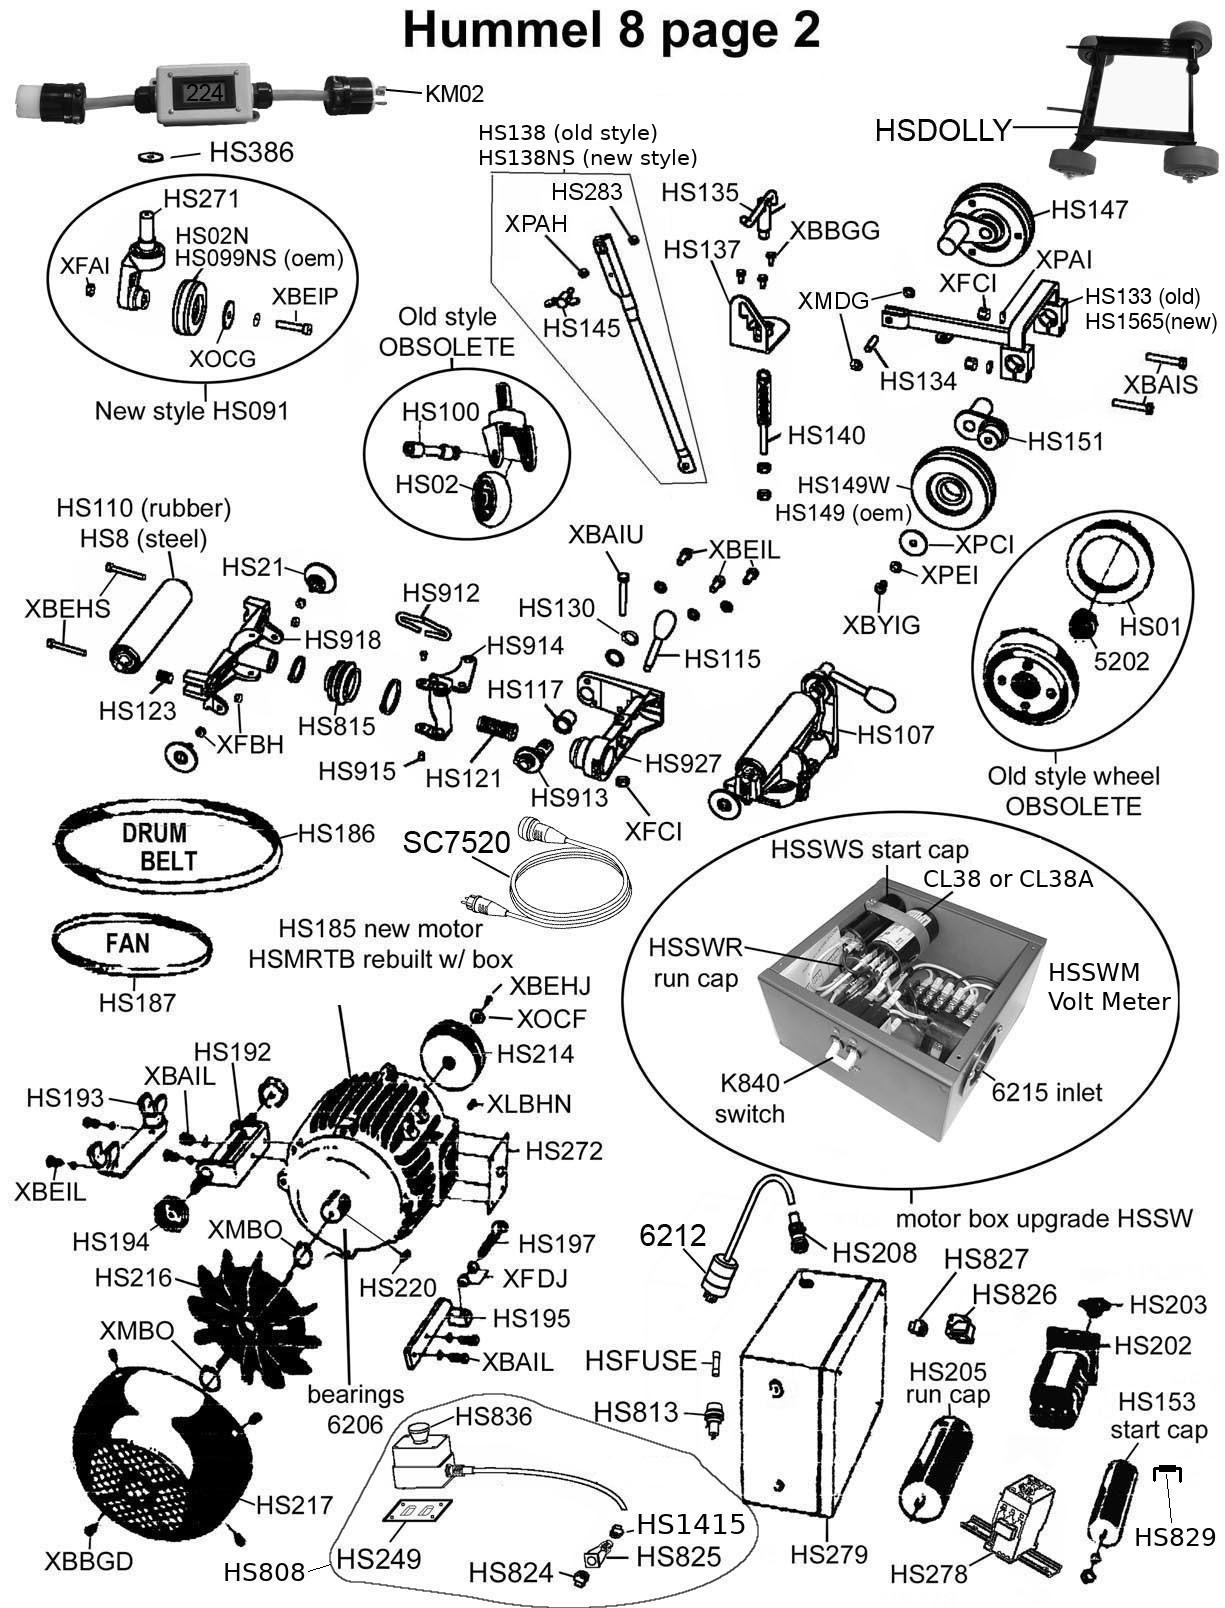 Parts Breakdown